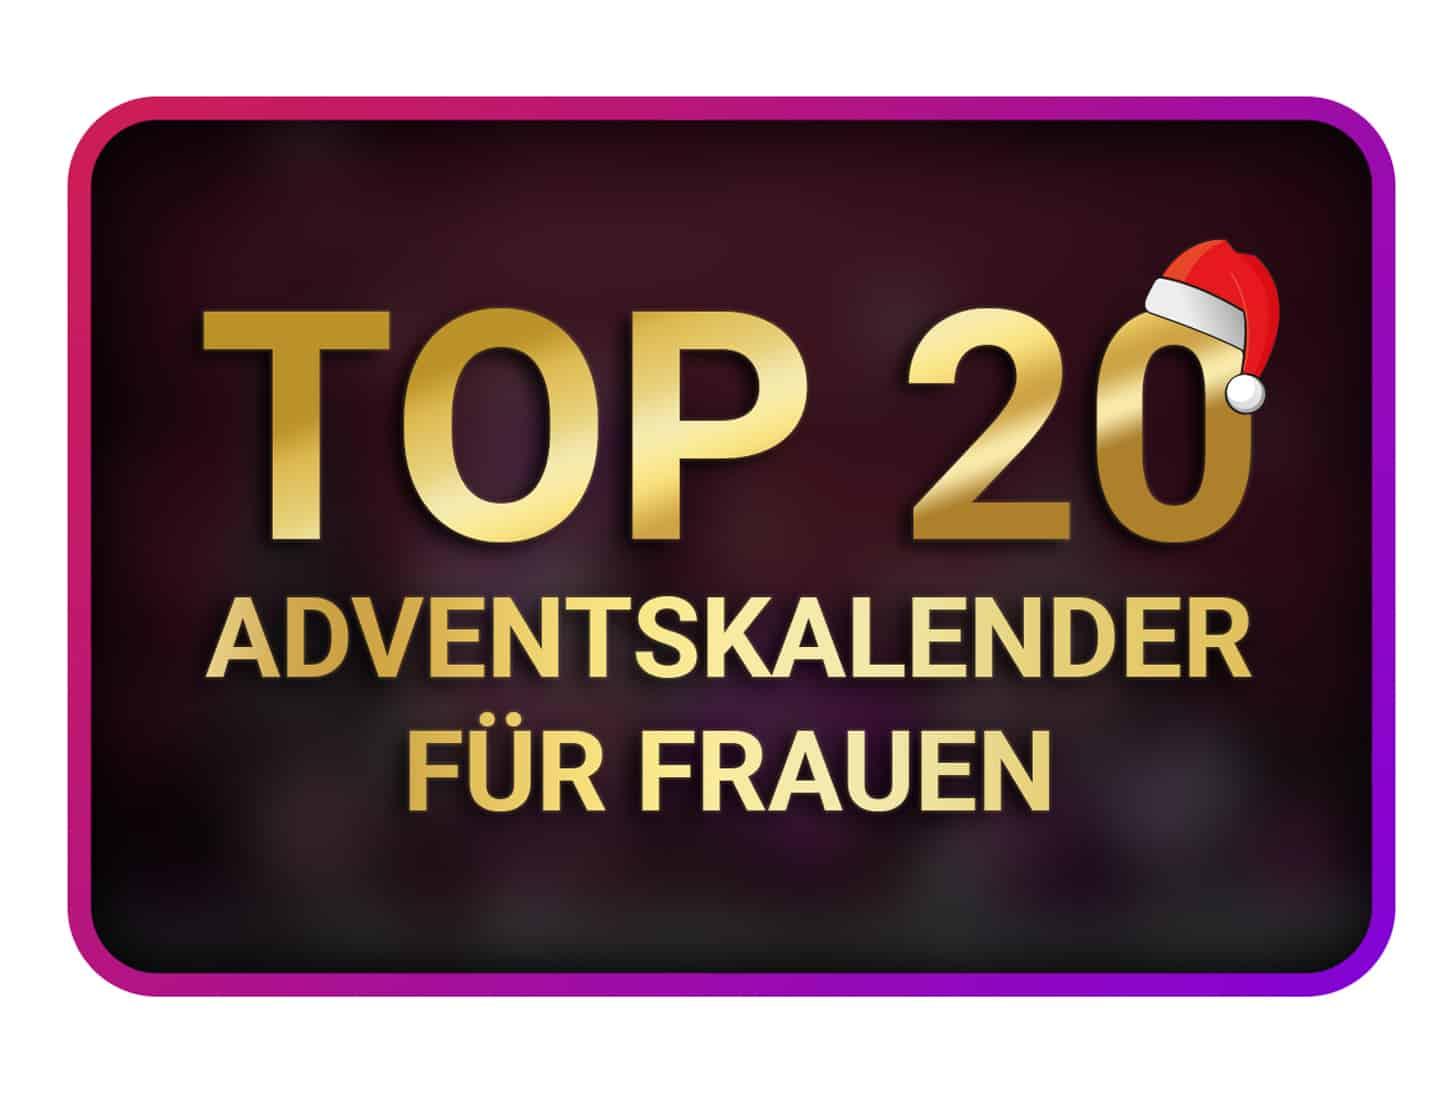 adventskalender-top20-frauen-2021